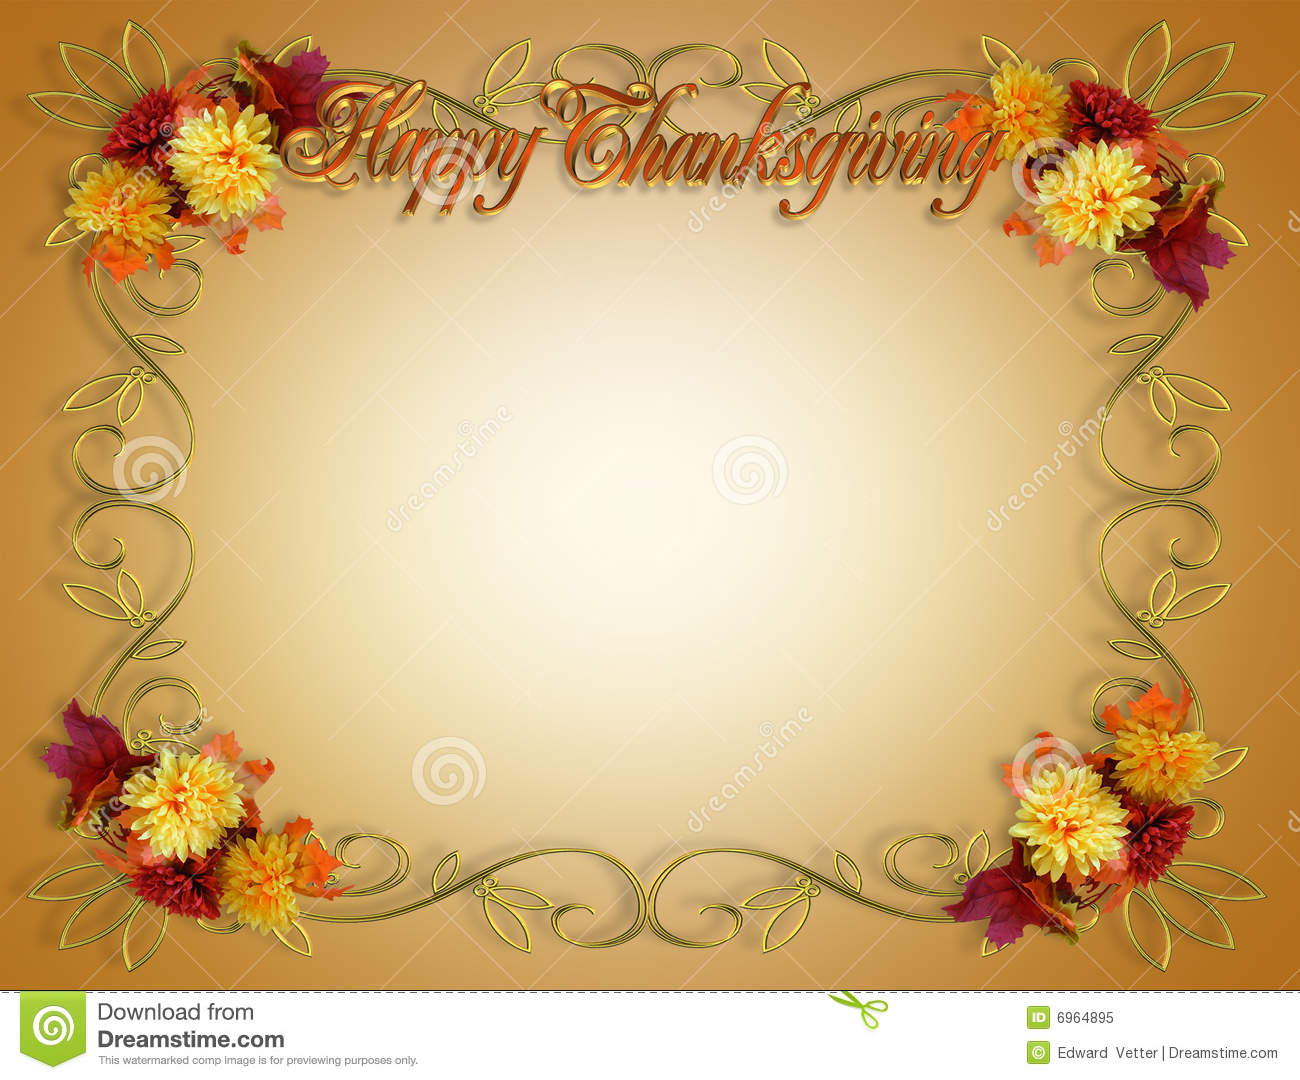 Thanksgiving Clip Art Borders-Thanksgiving Clip Art Borders-16